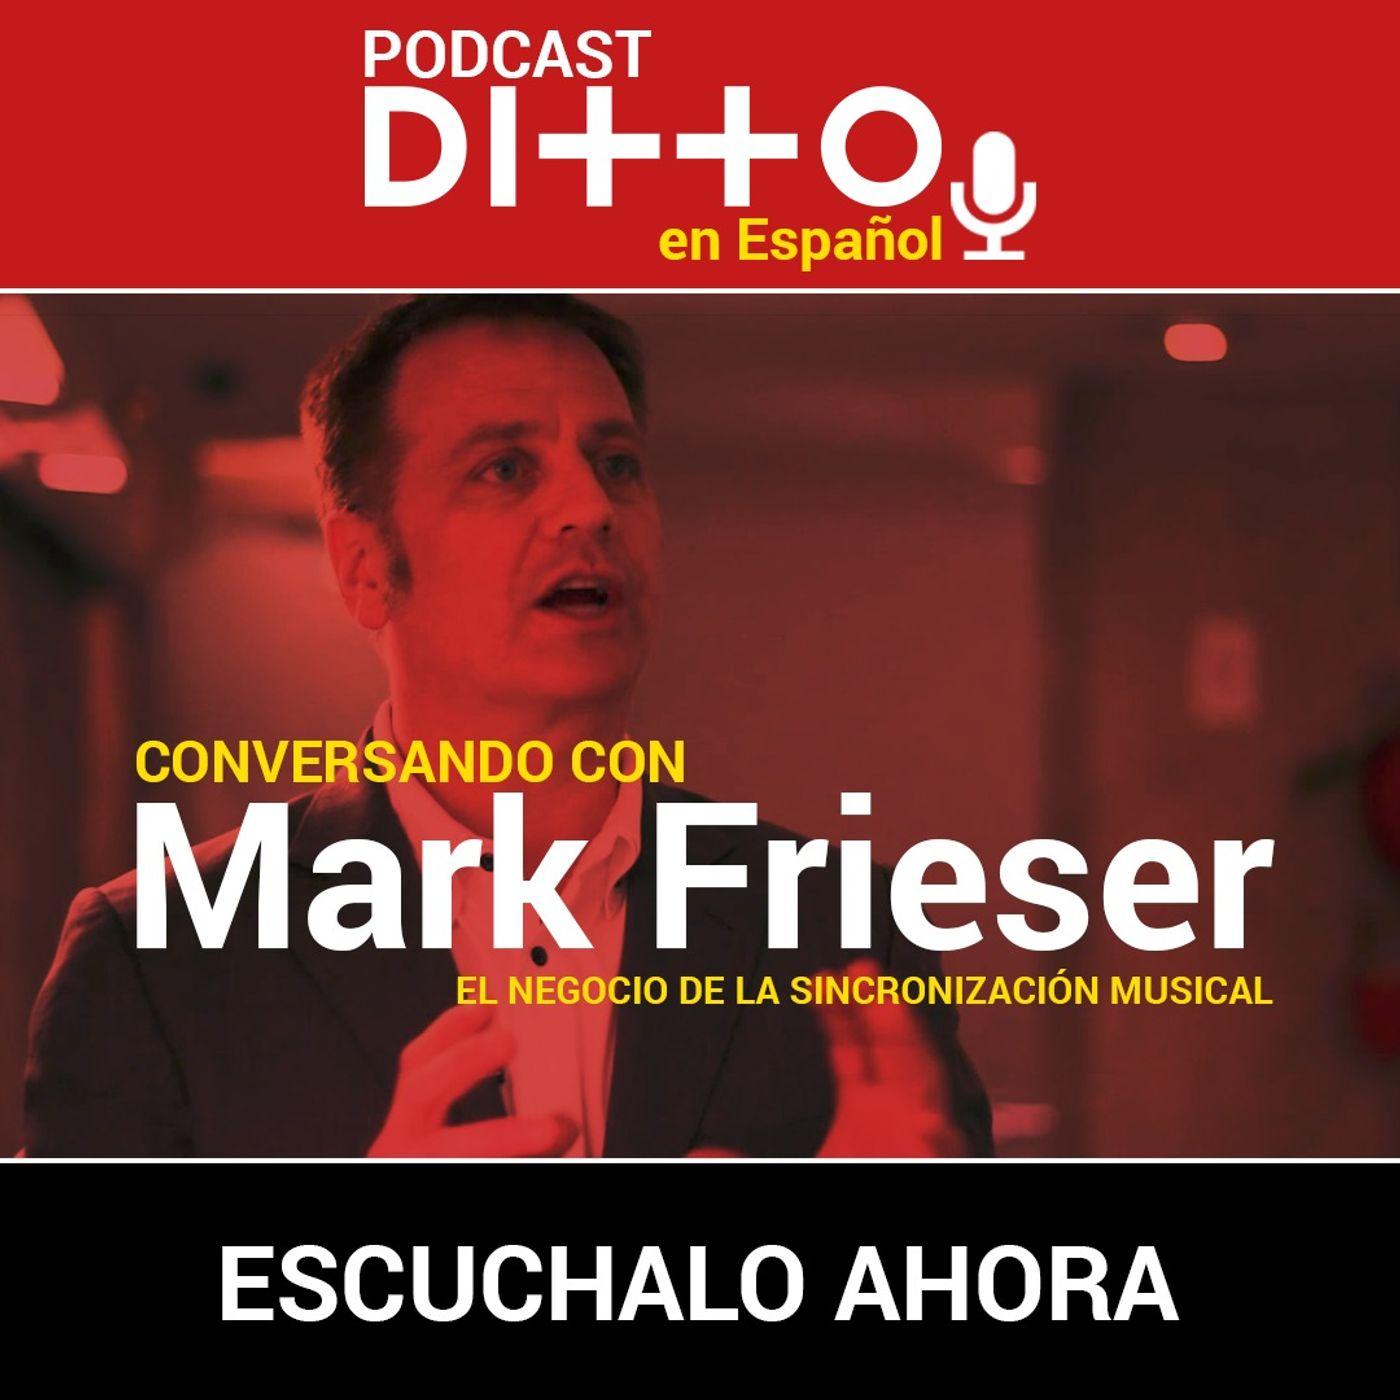 Conversando con Mark Frieser: Music Sync Business